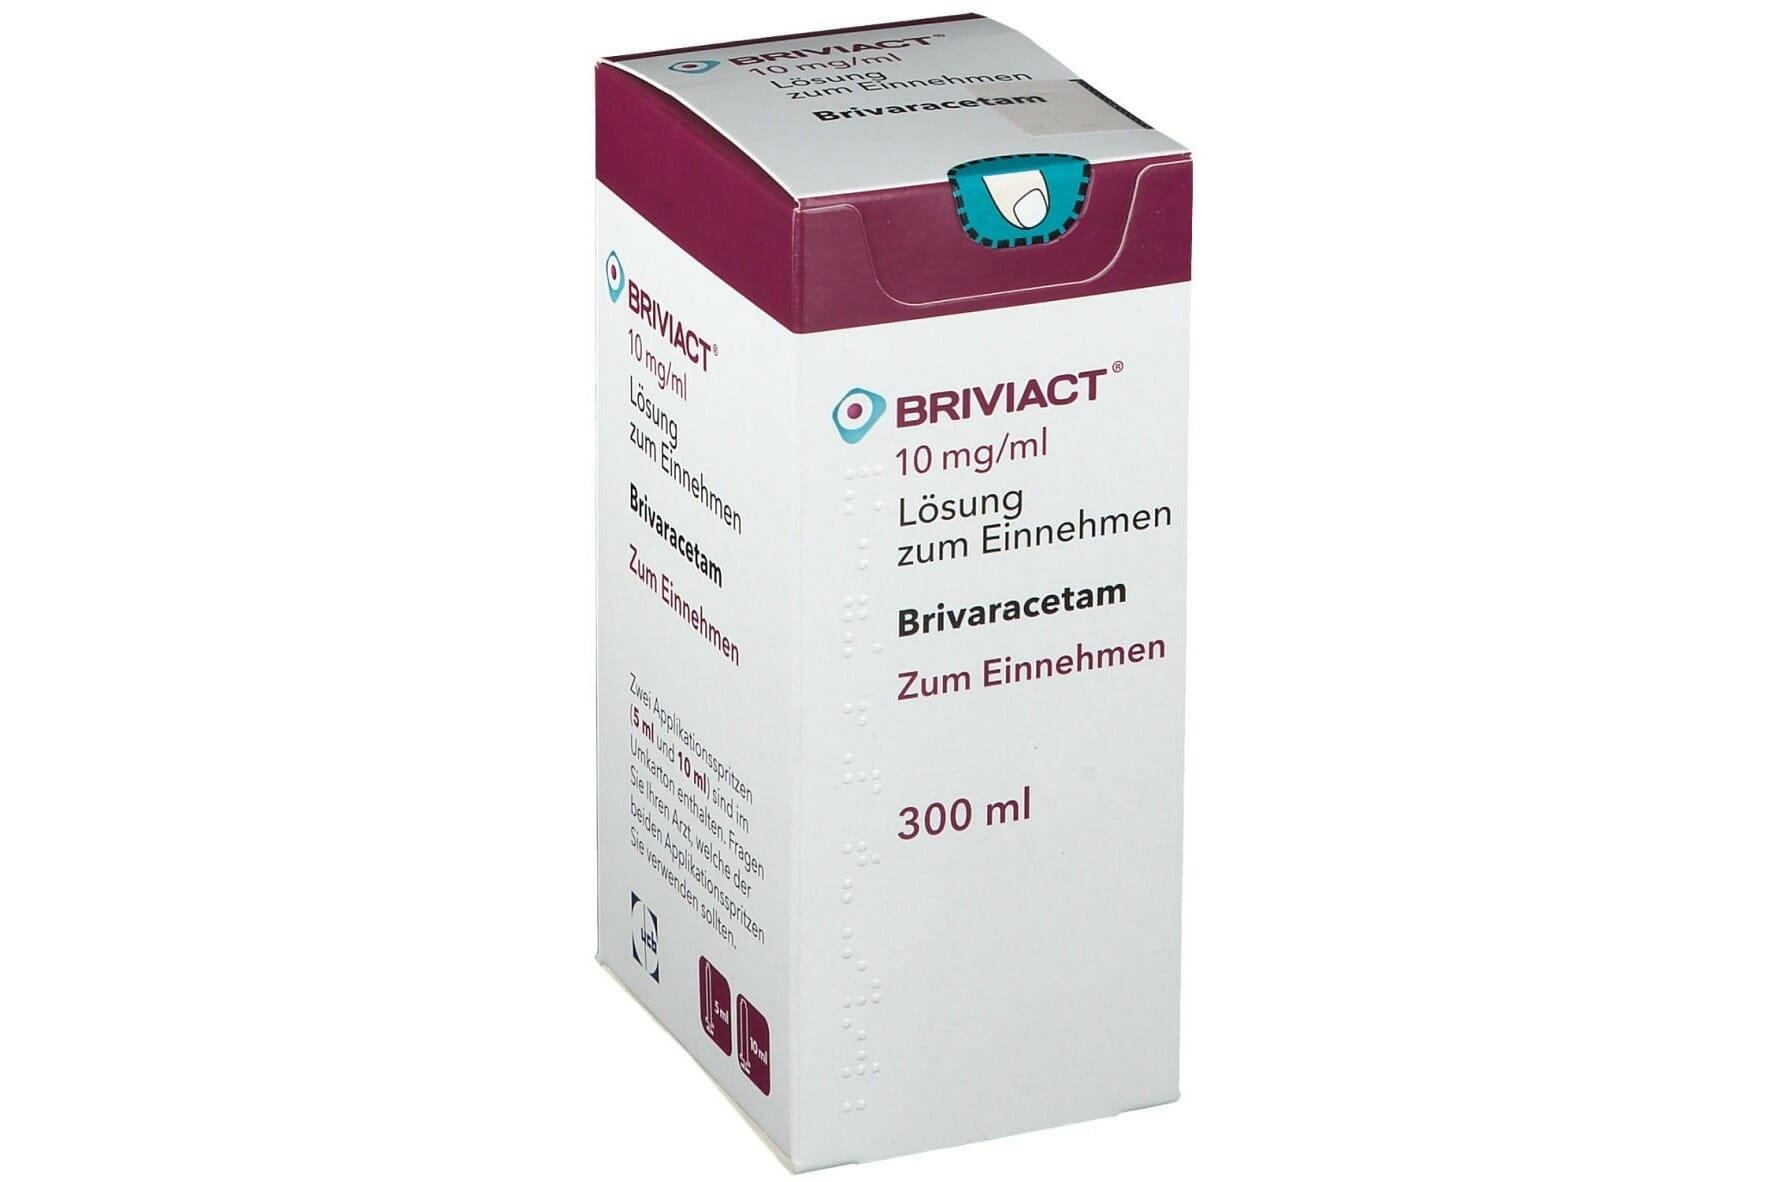 Briviact